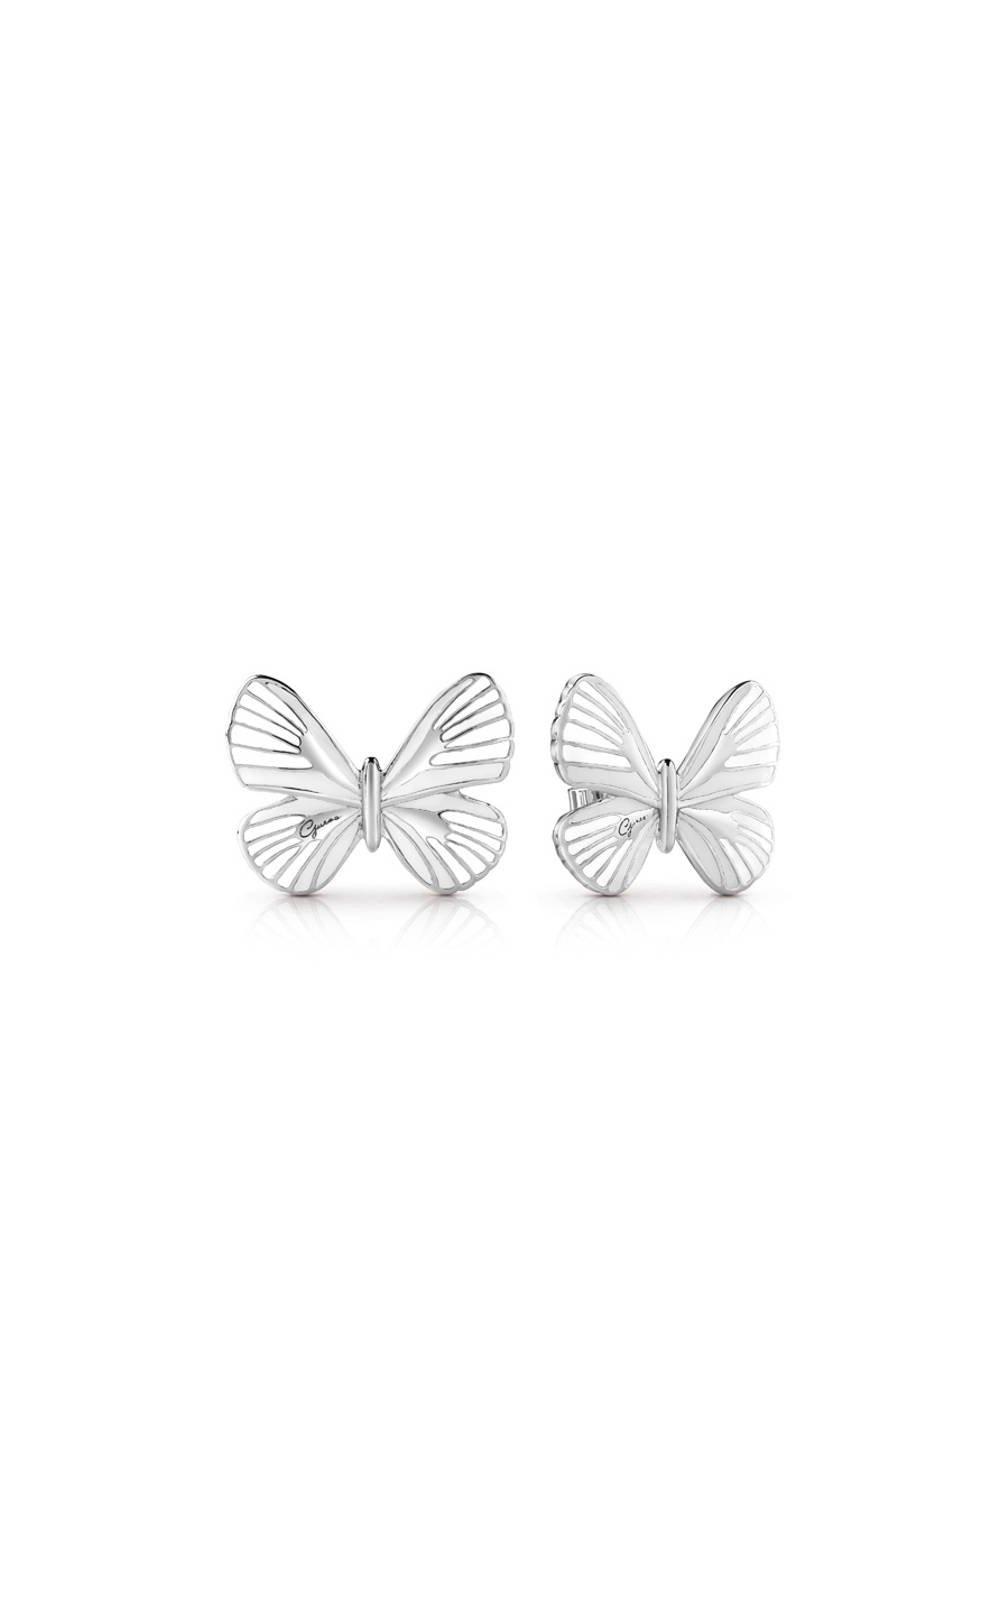 GUESS FAUX UBE85090 Ασημένια Σκουλαρίκια Με Άσπρη Πεταλούδα